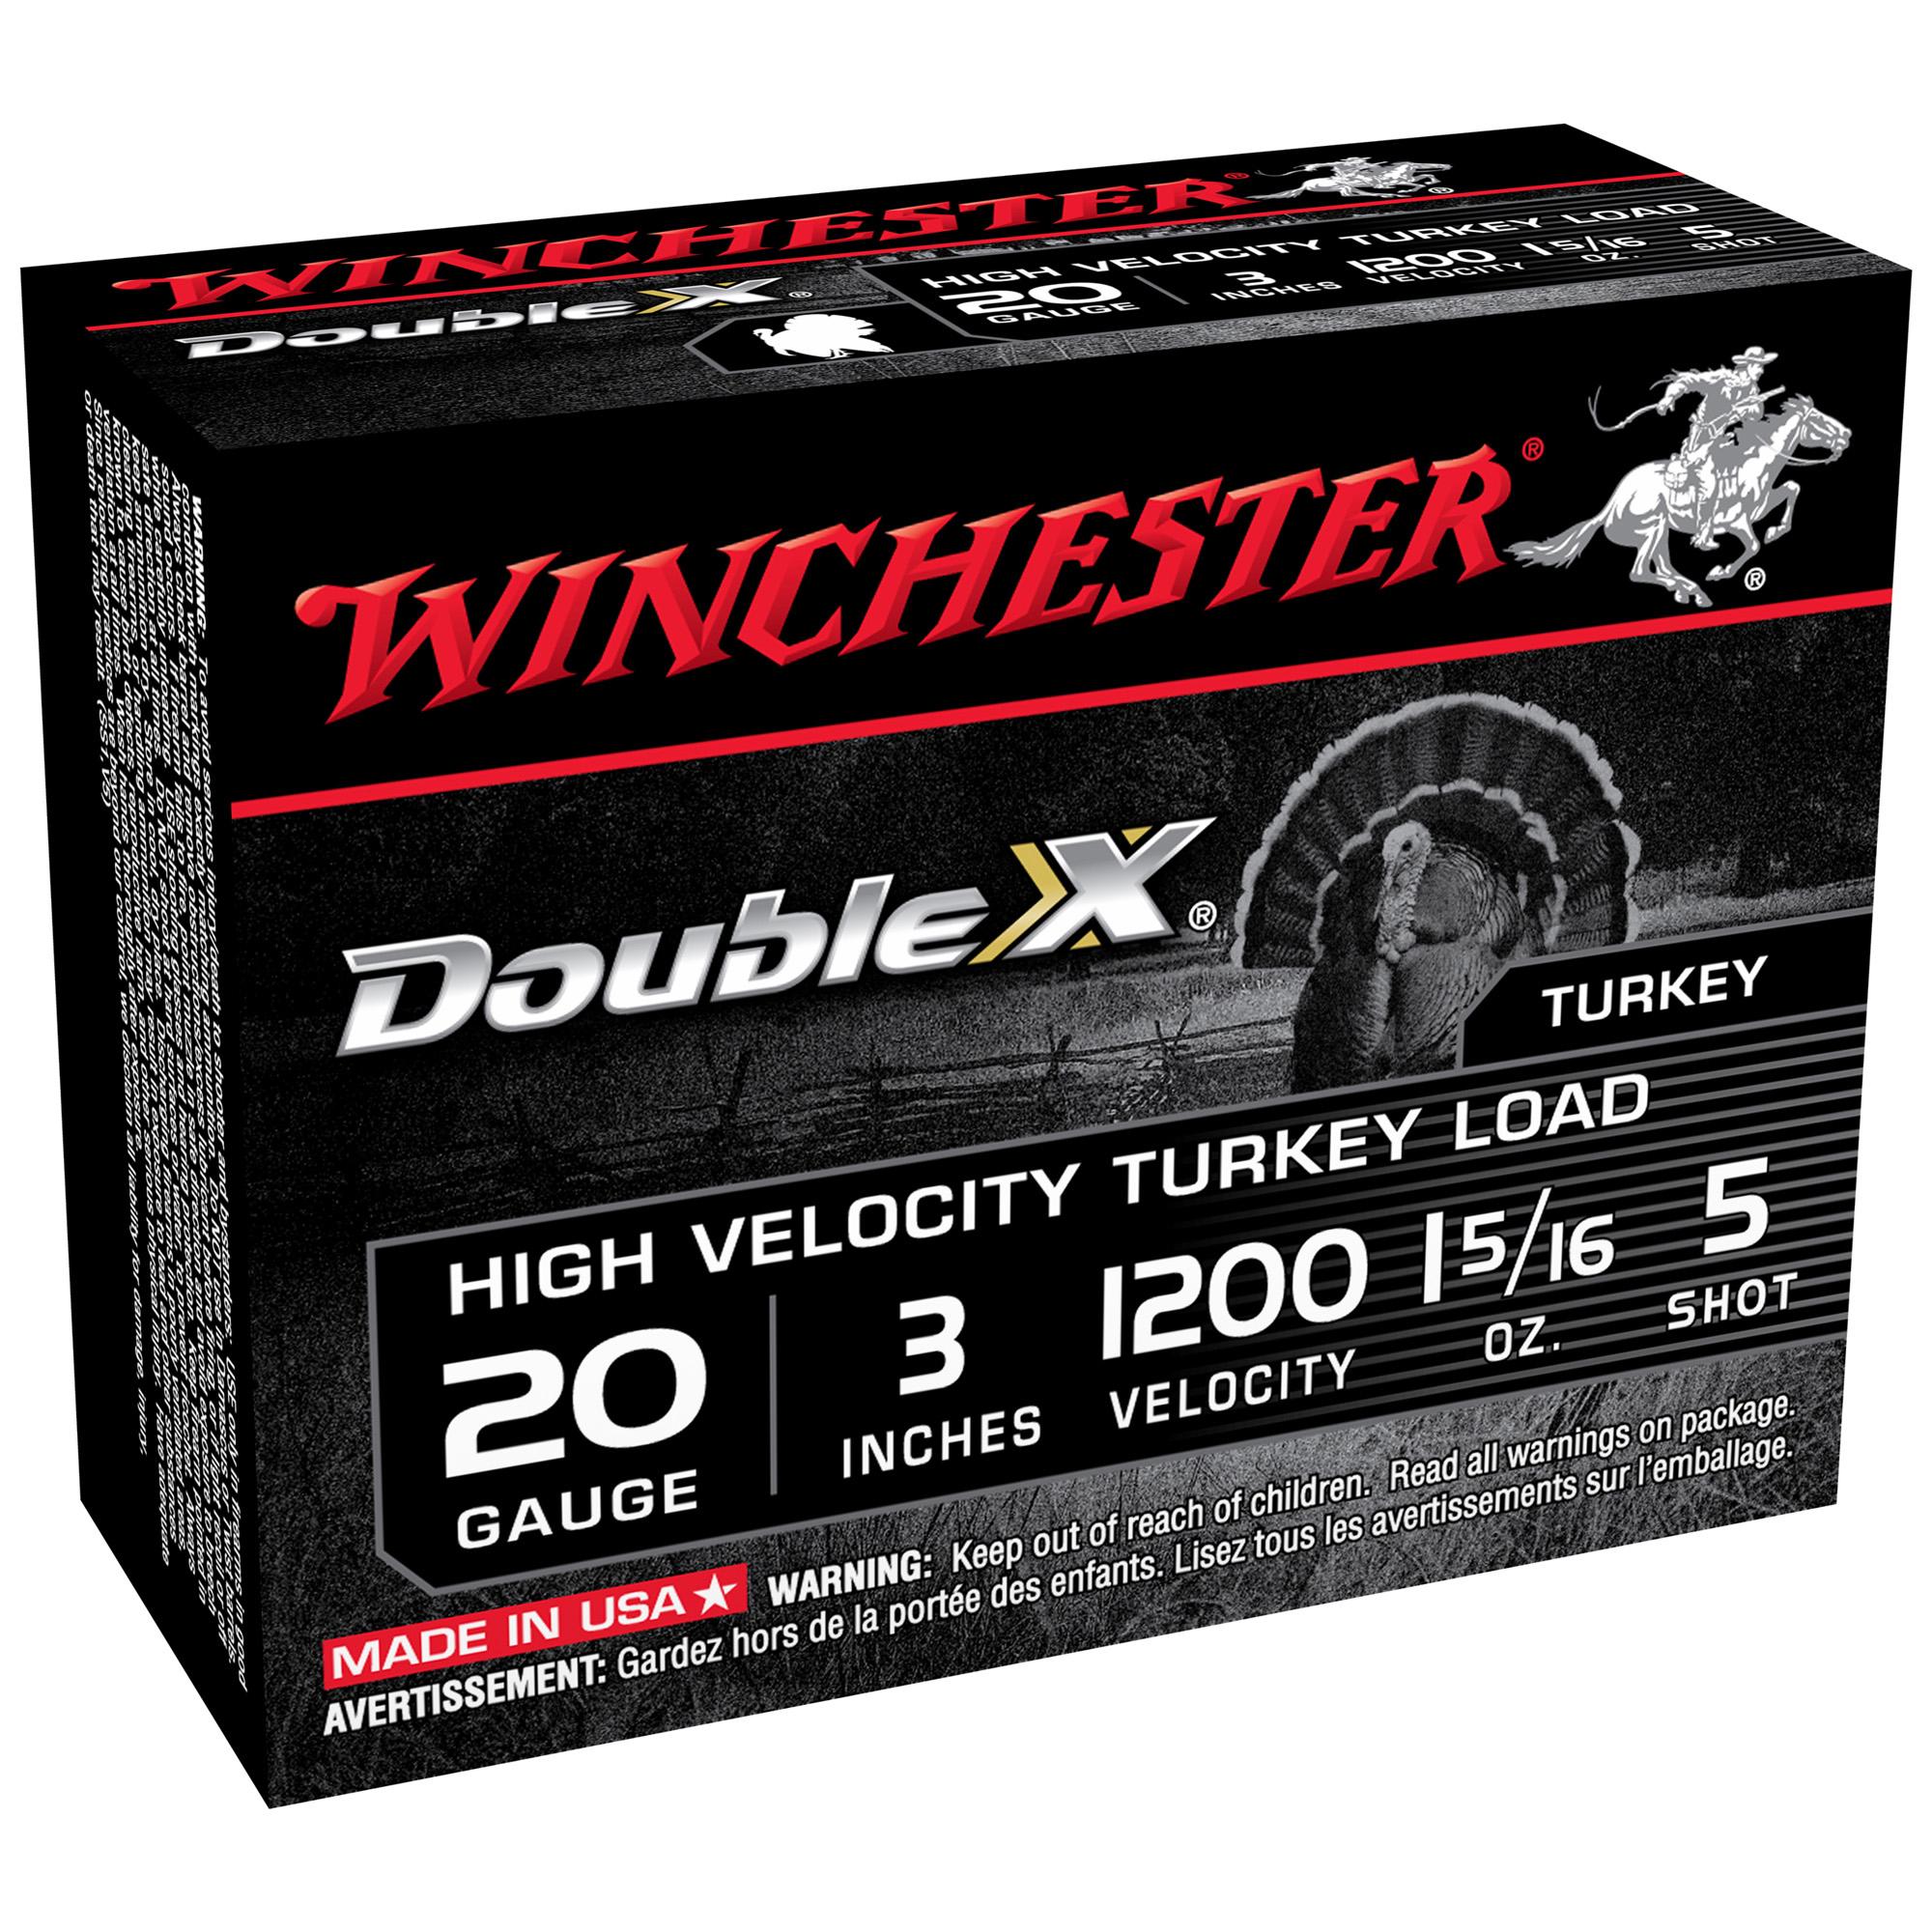 Winchester Double X Turkey Ammo, 20 Gauge, 3″, 1-5/16 oz, #5